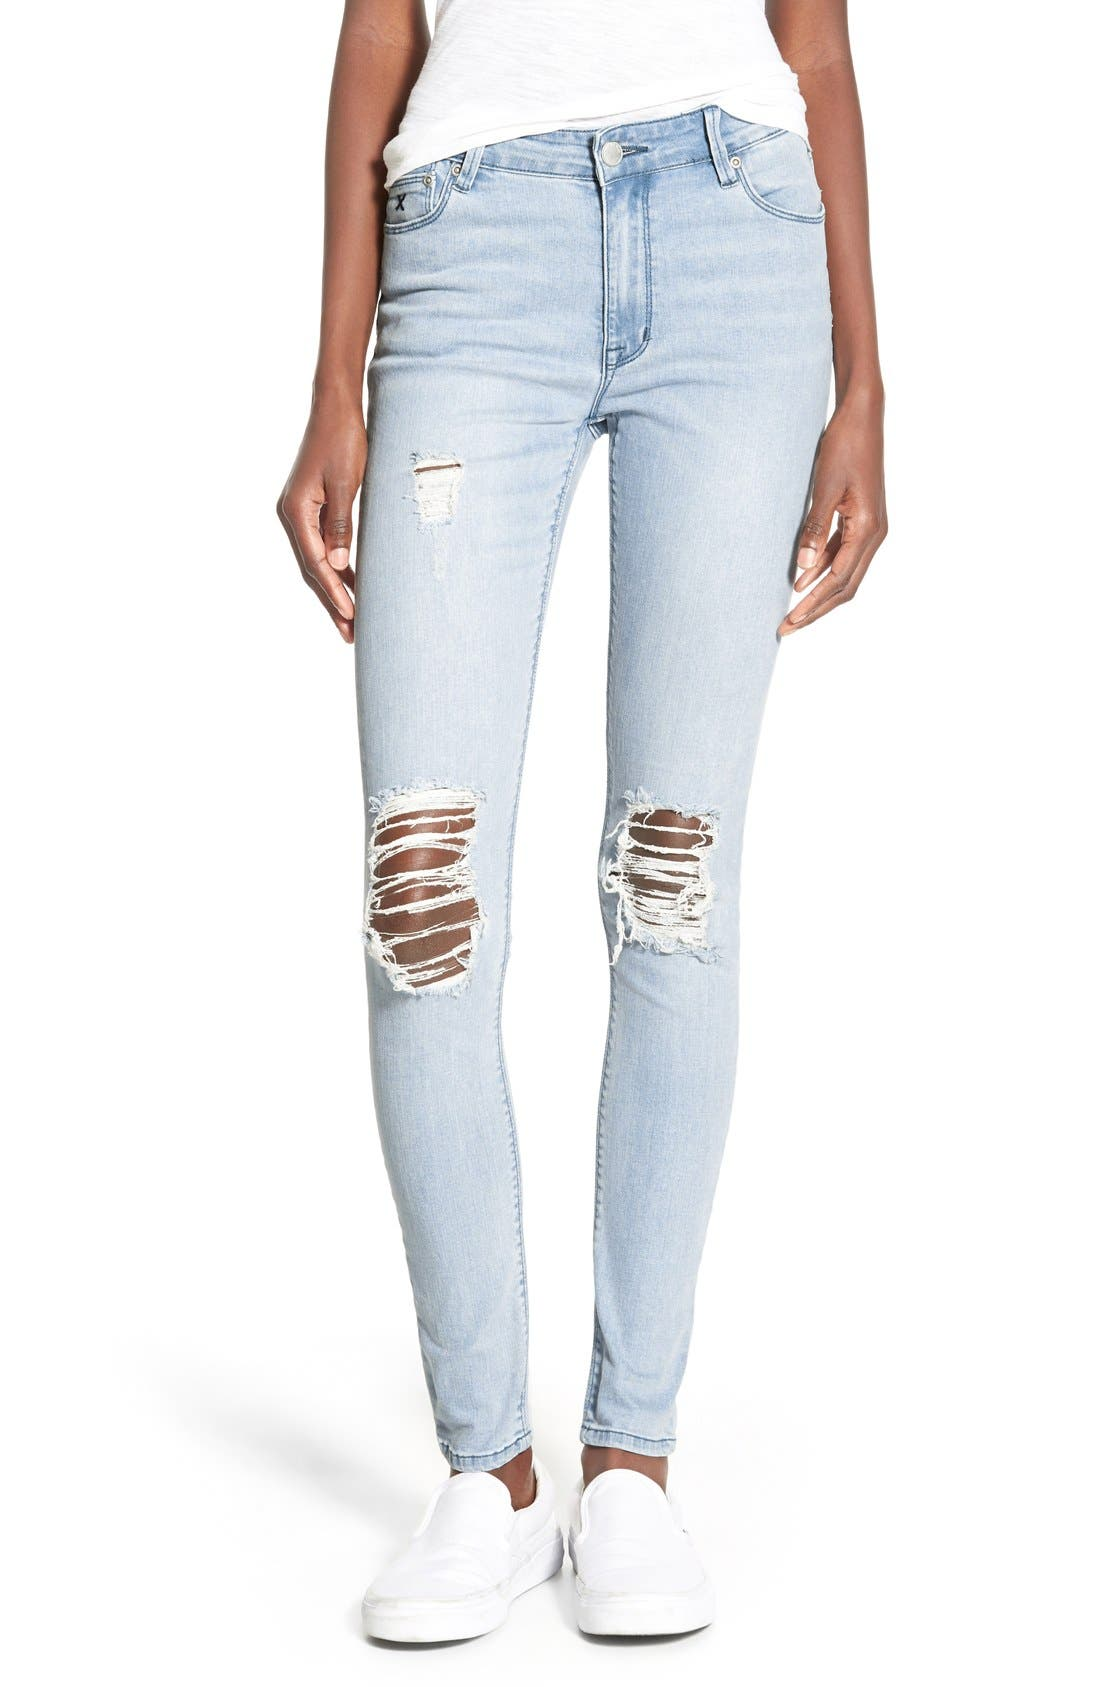 Main Image - RES Denim 'Kitty' Skinny Jeans (Love Moves Destroyer)